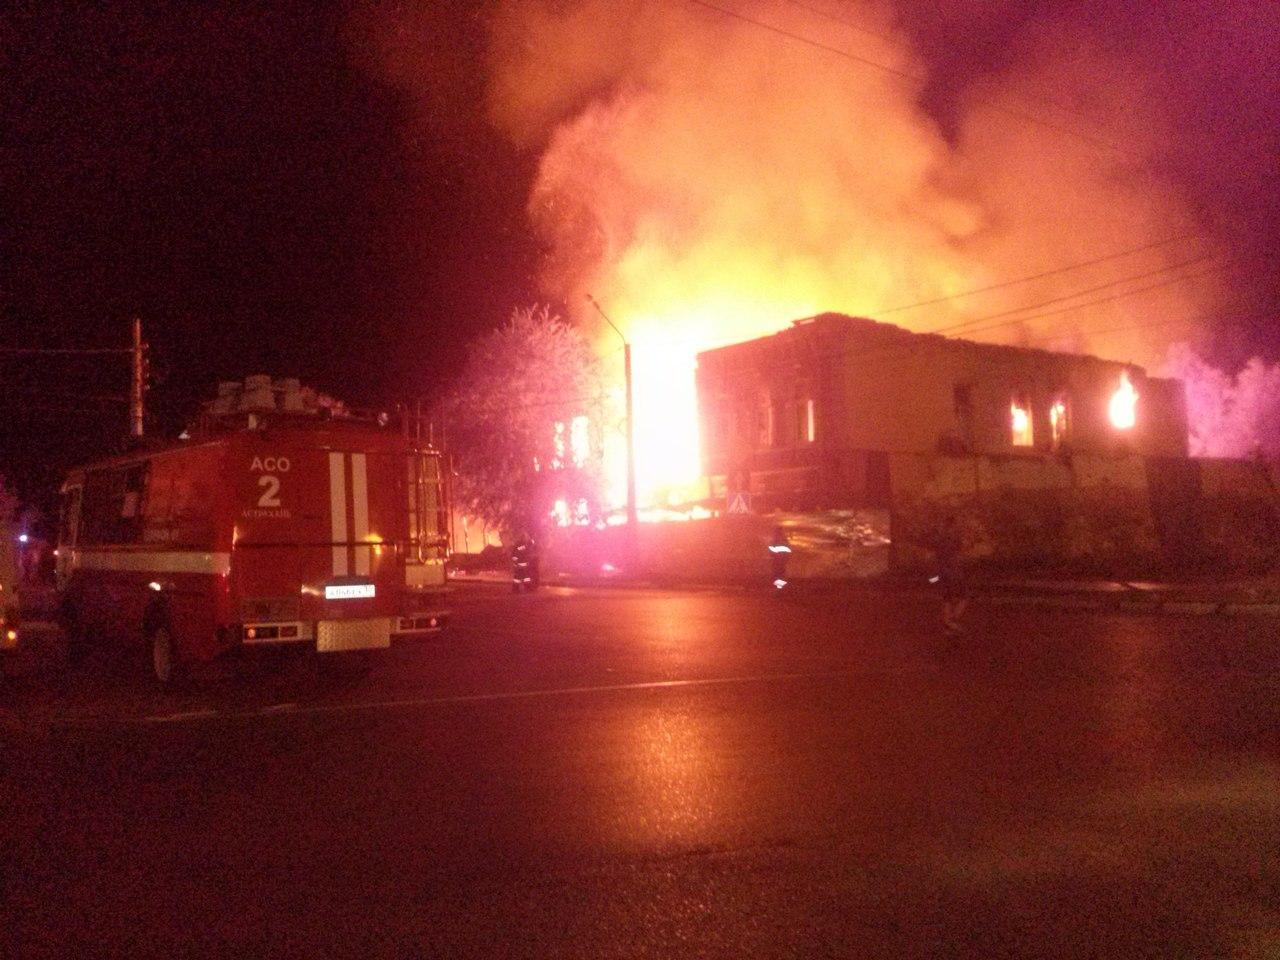 images novosti2 Proisshestviya Pozhar o9k6p2yab24 Крупный пожар уничтожил два старинных здания в Астрахани